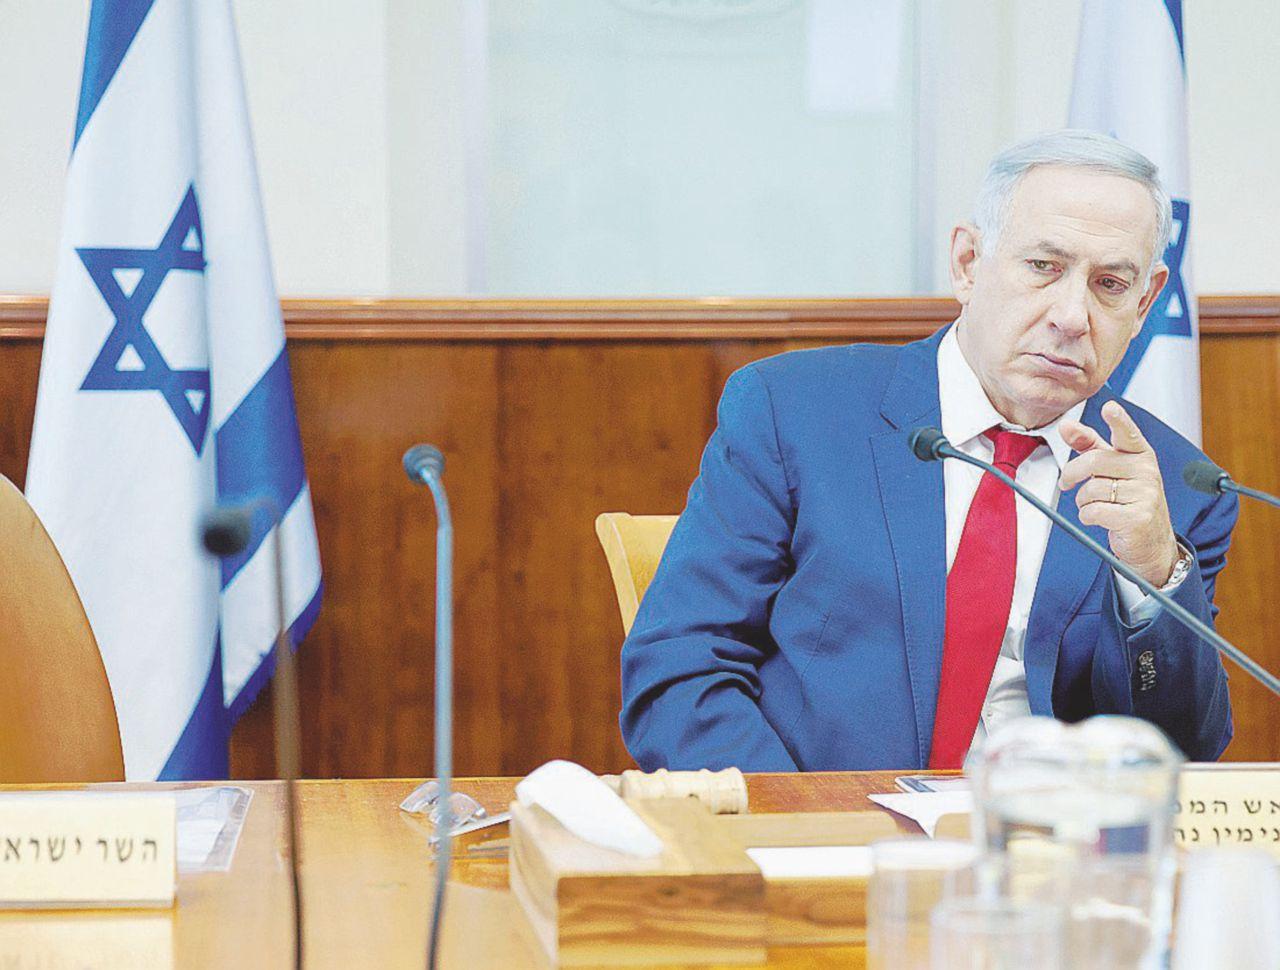 Netanyahu e i fondi sospetti: torchiato per ore l'ex capostaff